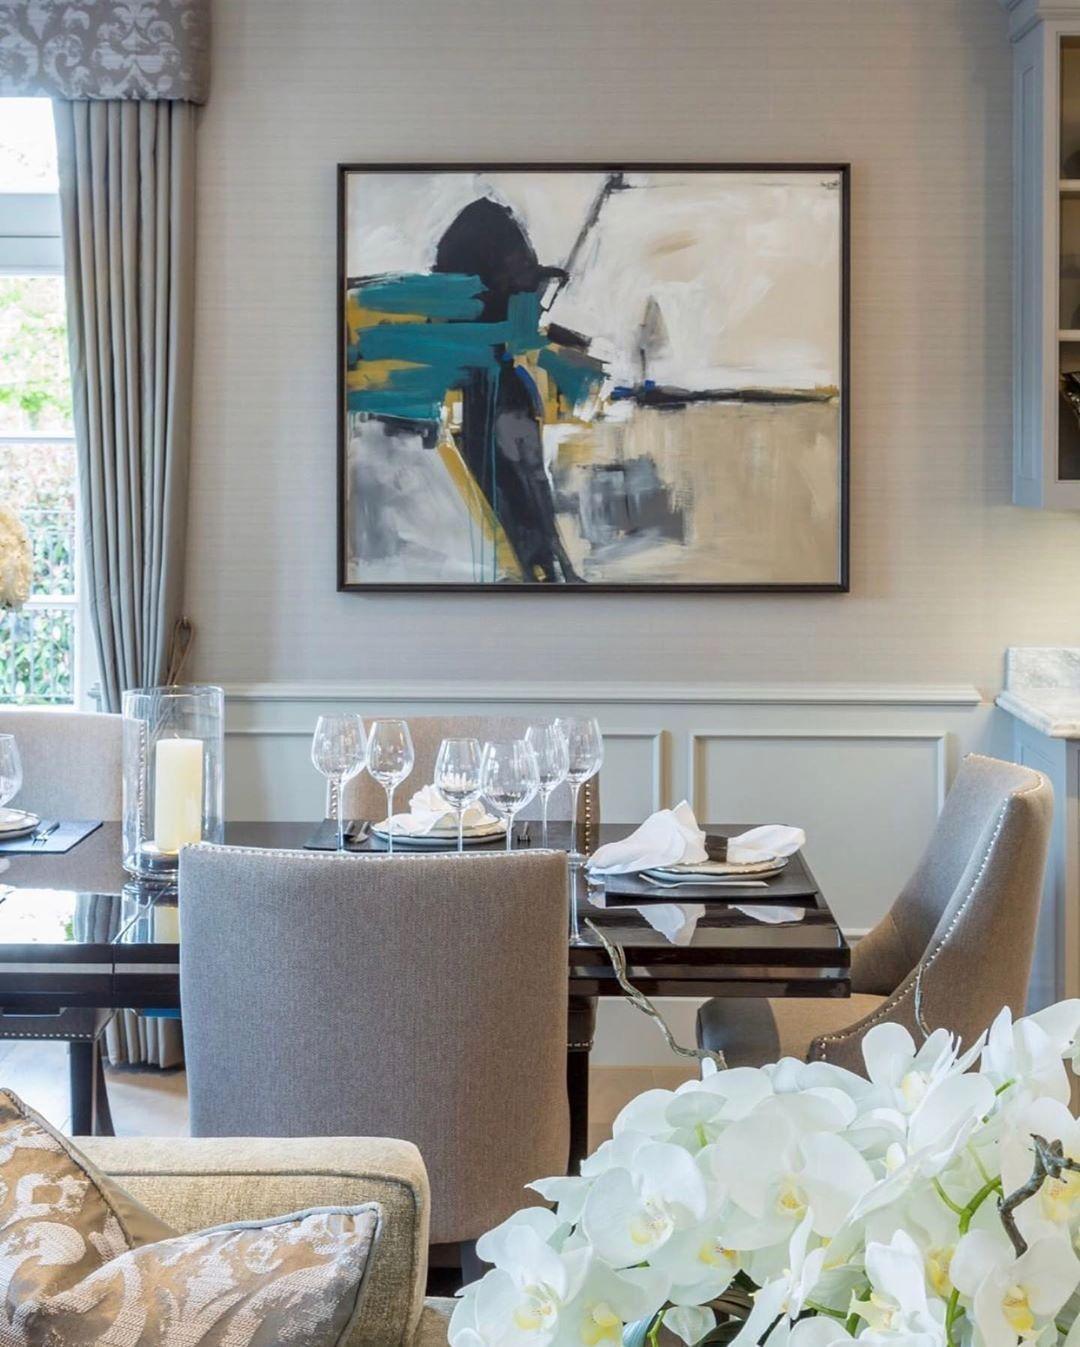 "Interior Design ▪️ Home Decor on Instagram: ""Design: @alexanderjamesinteriors  Follow @olla_home for more inspiration❤️ • • • • • • #diningroomdesign #diningroomdecor #diningroom…"""